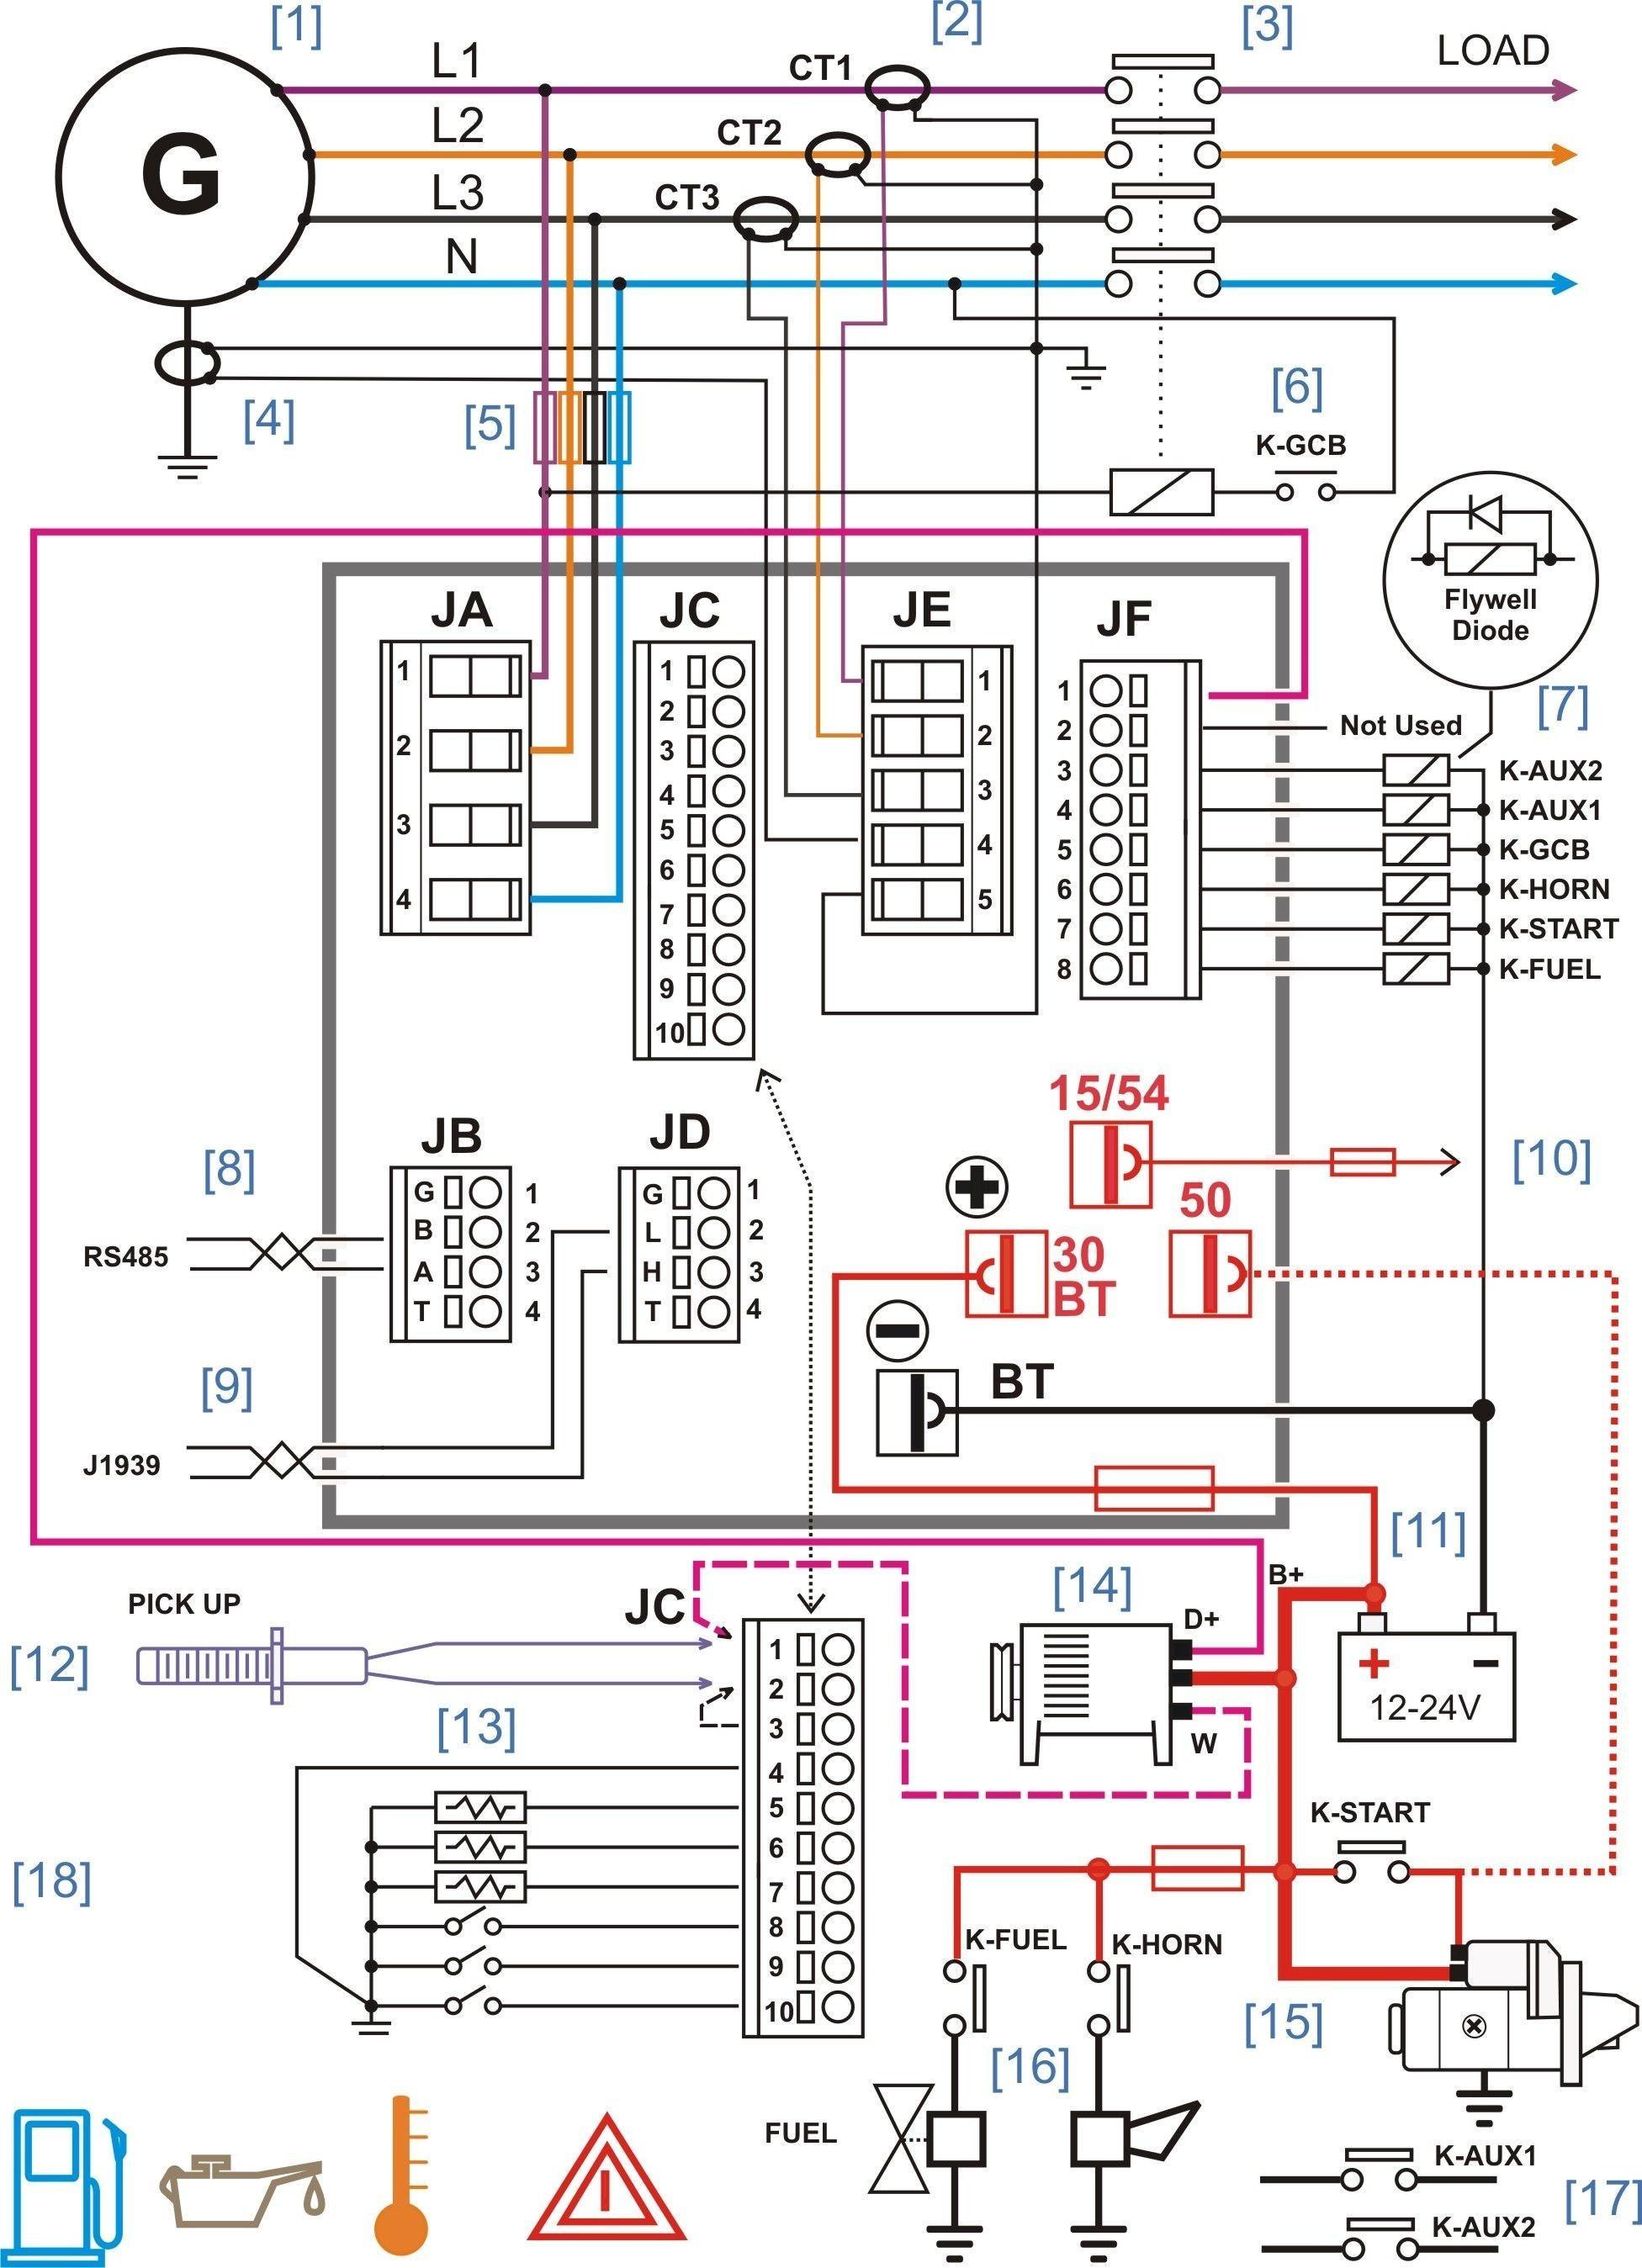 hight resolution of caterpillar c12 engine diagram olympian generator wiring diagram 4001e caterpillar inspirationa new